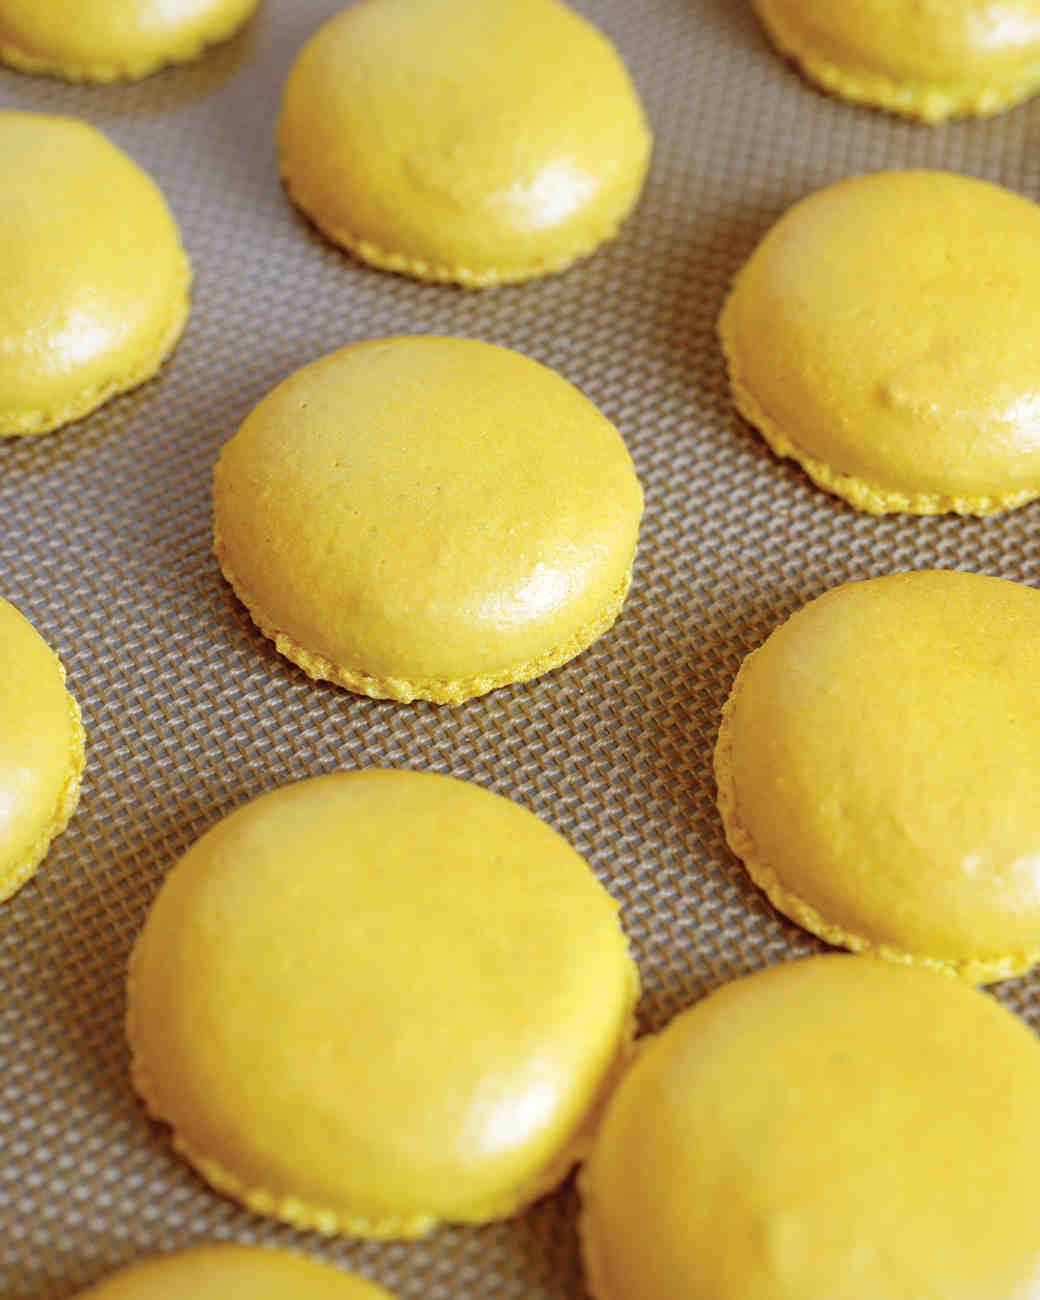 macaron-diy-how-to-0315.jpg